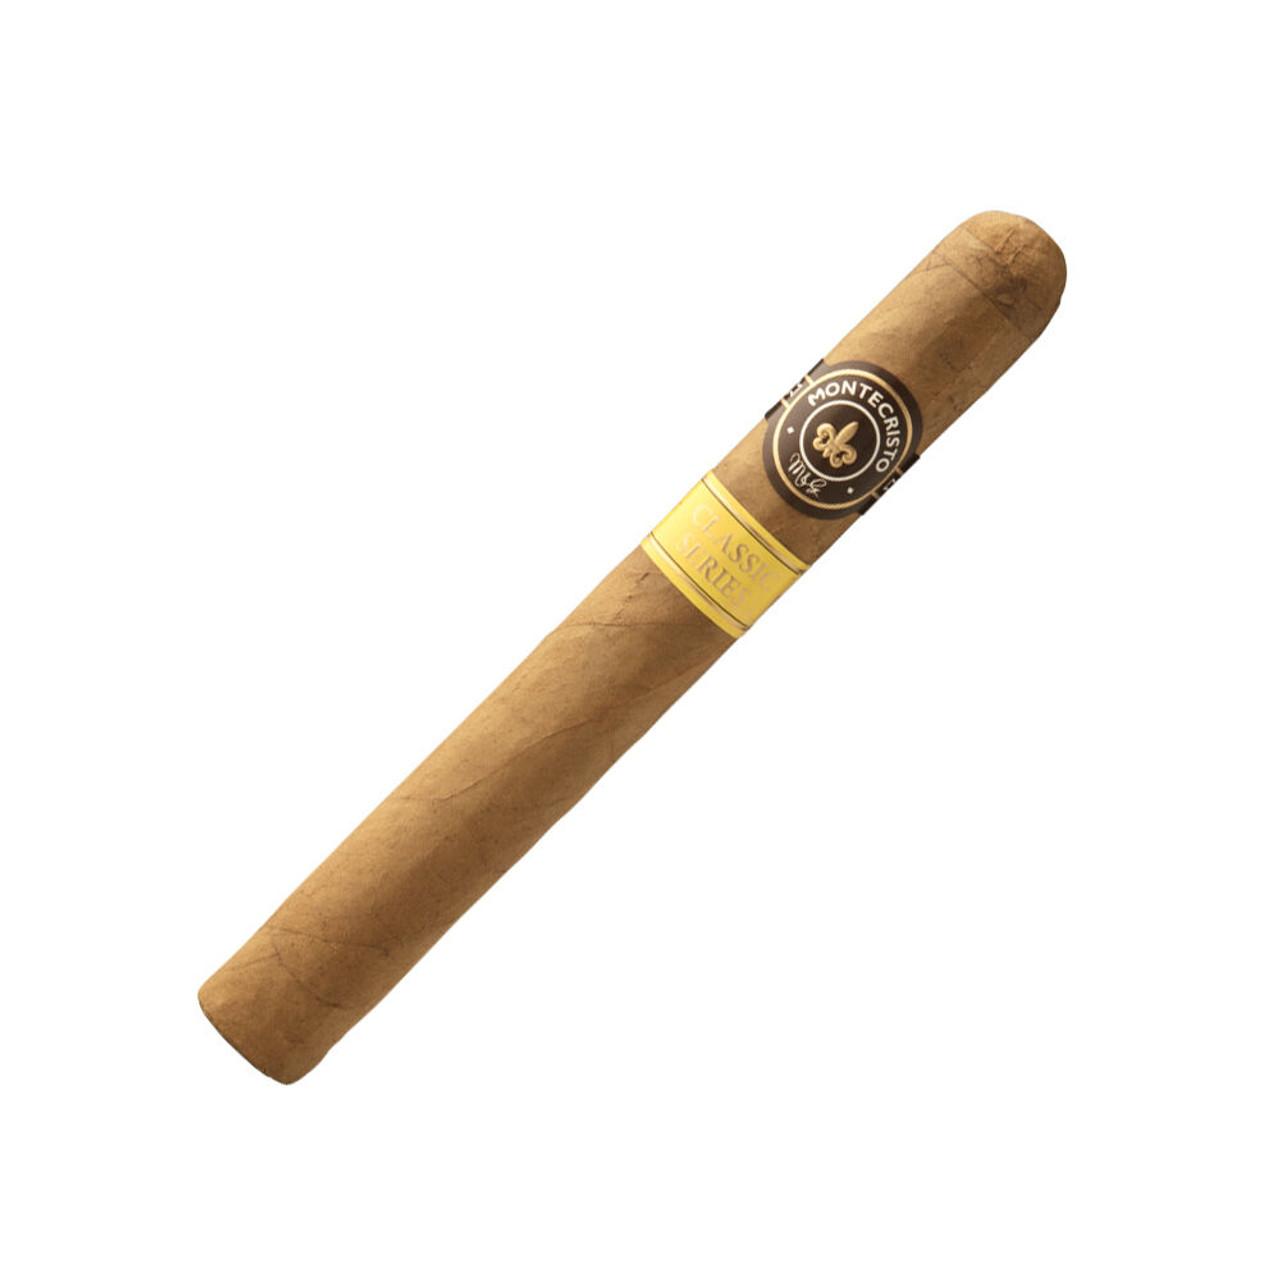 Montecristo Classic Especial No. 3 Cigars - 5.5 x 44 (Box of 20)